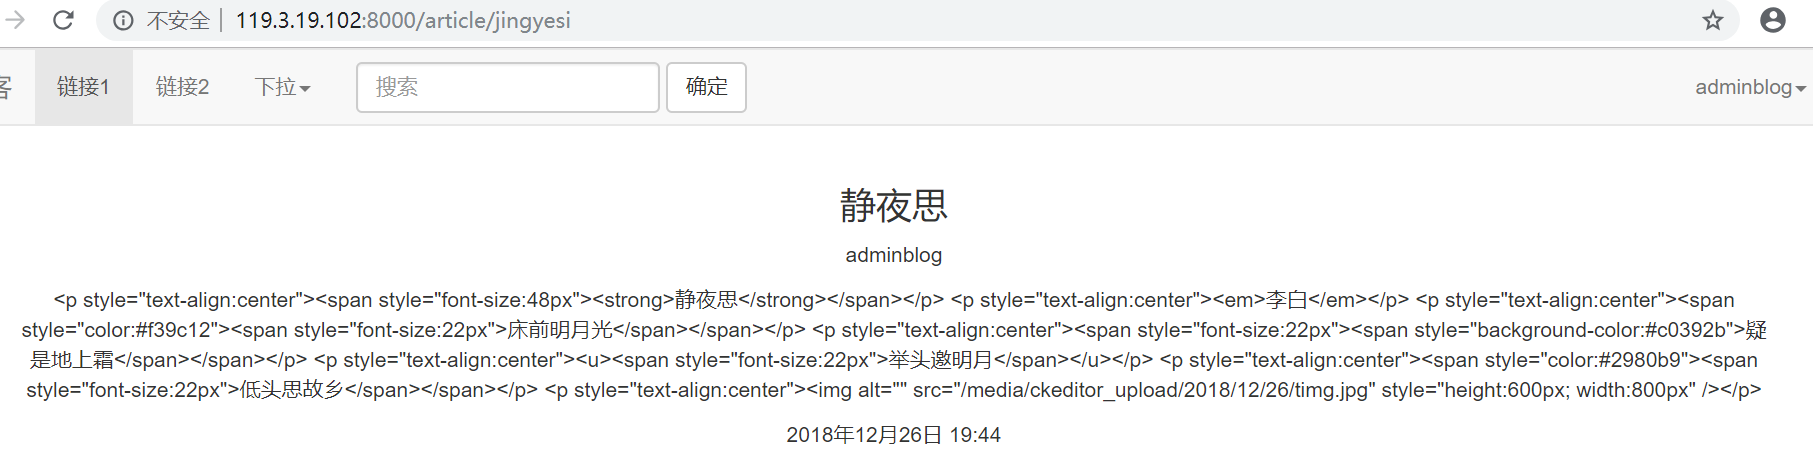 jerrycoding Django建站历程:(十)CKEditor的配置使用